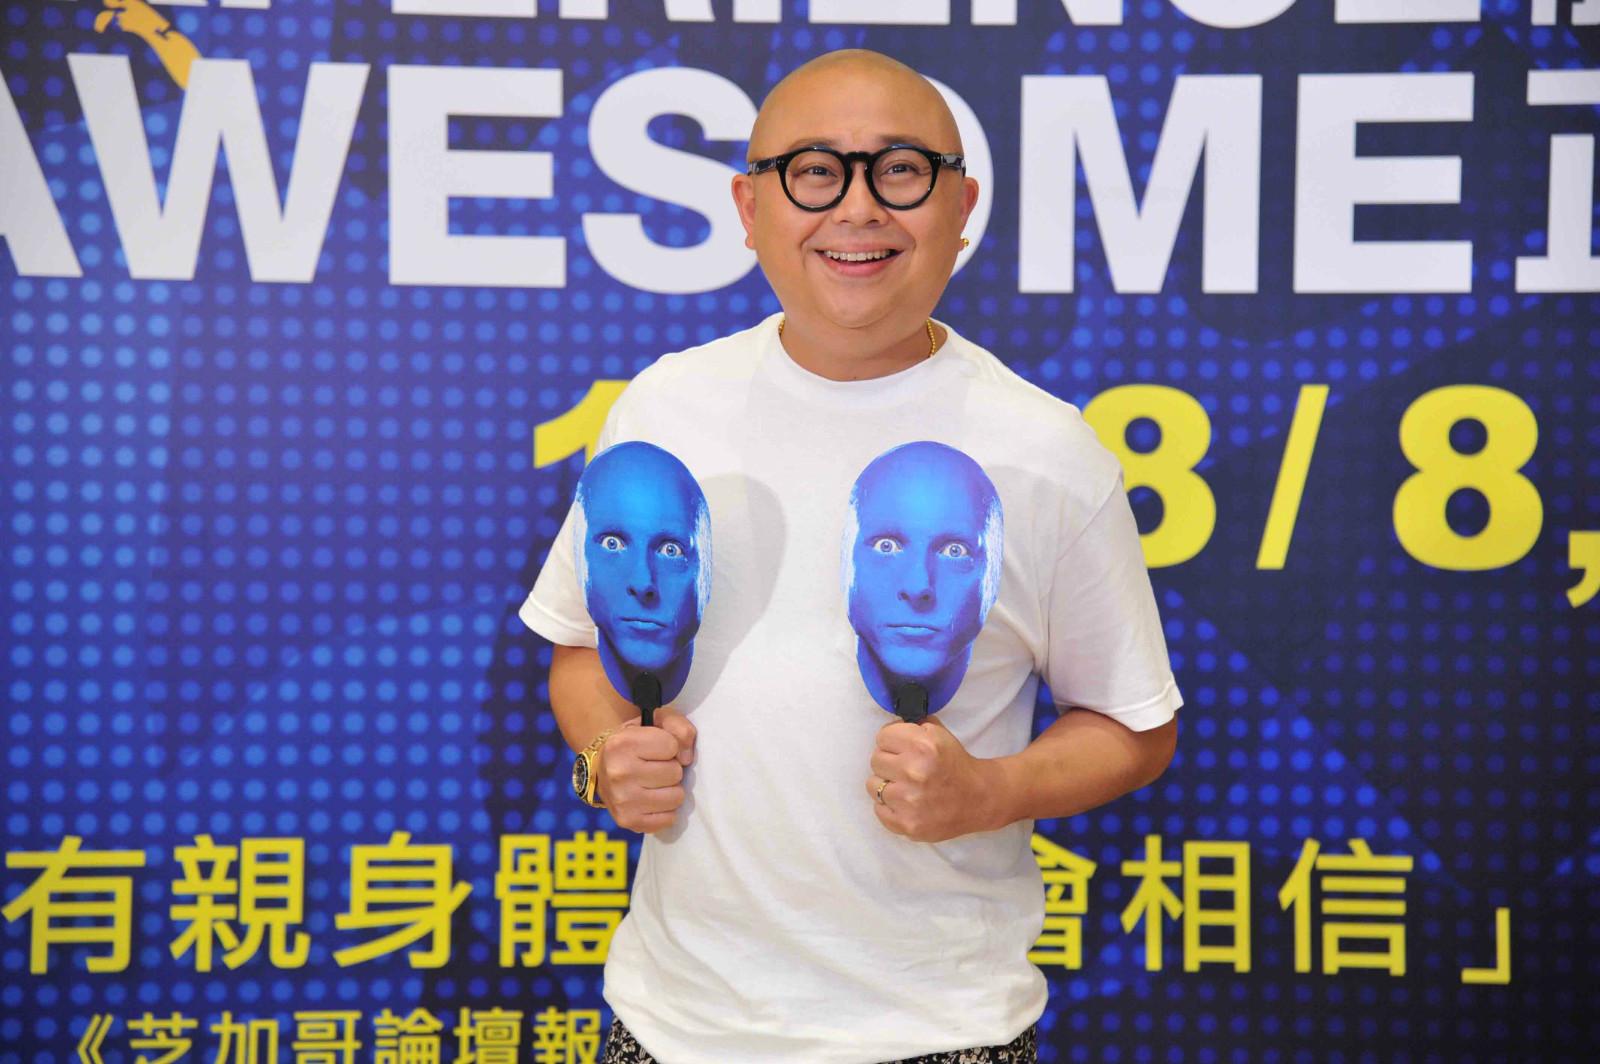 Famous Hong Kong host Bob Lam